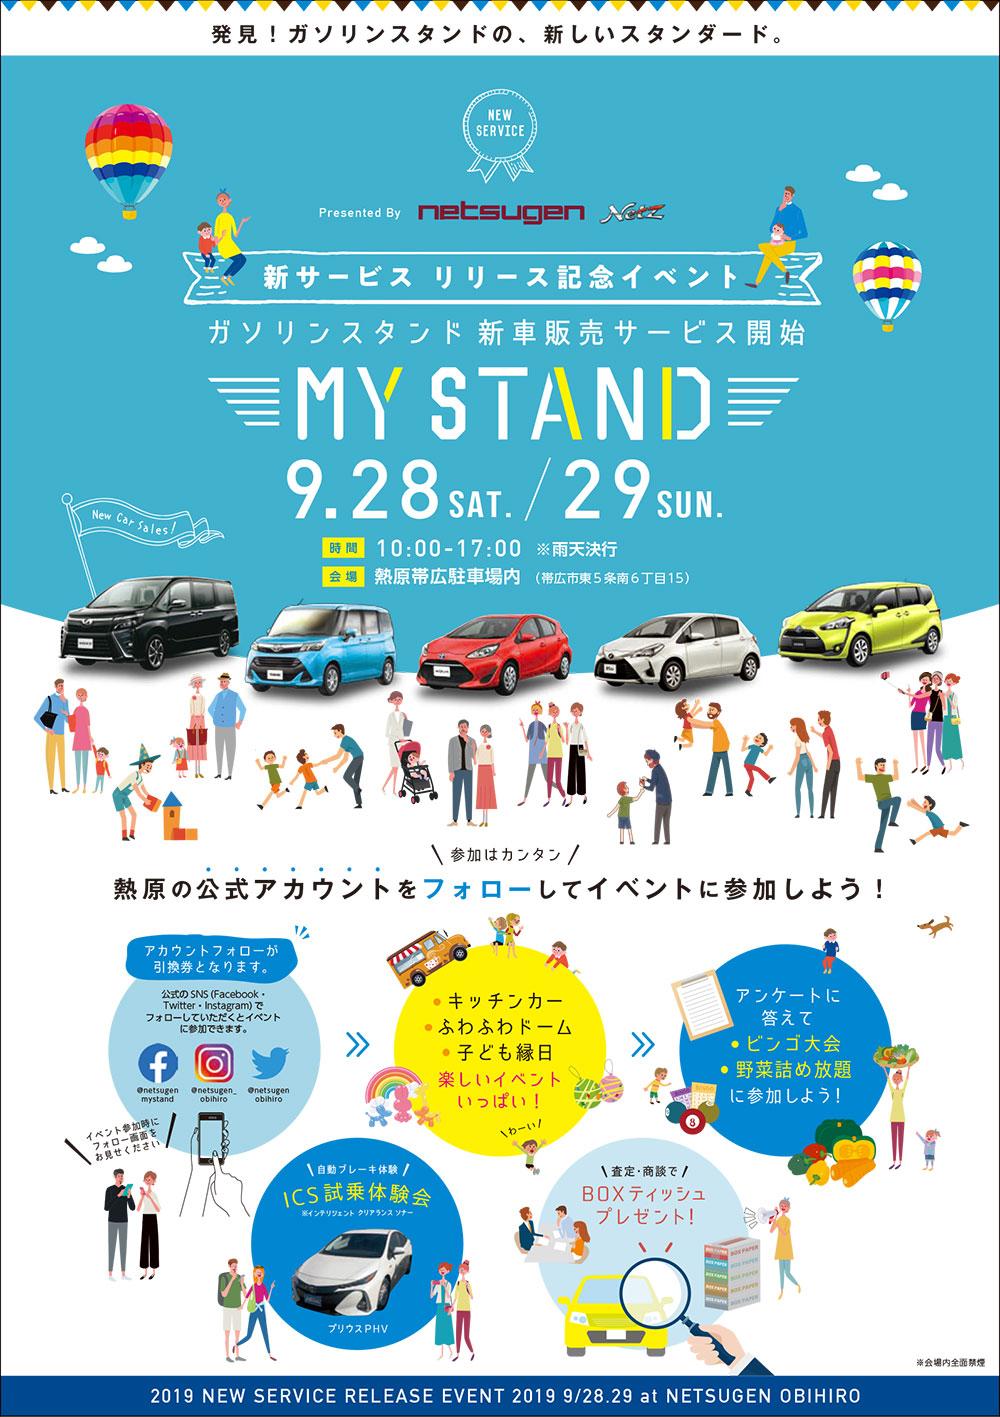 http://www.netsugen.co.jp/obihiro/information/images/maystand_190928-29-1.jpg